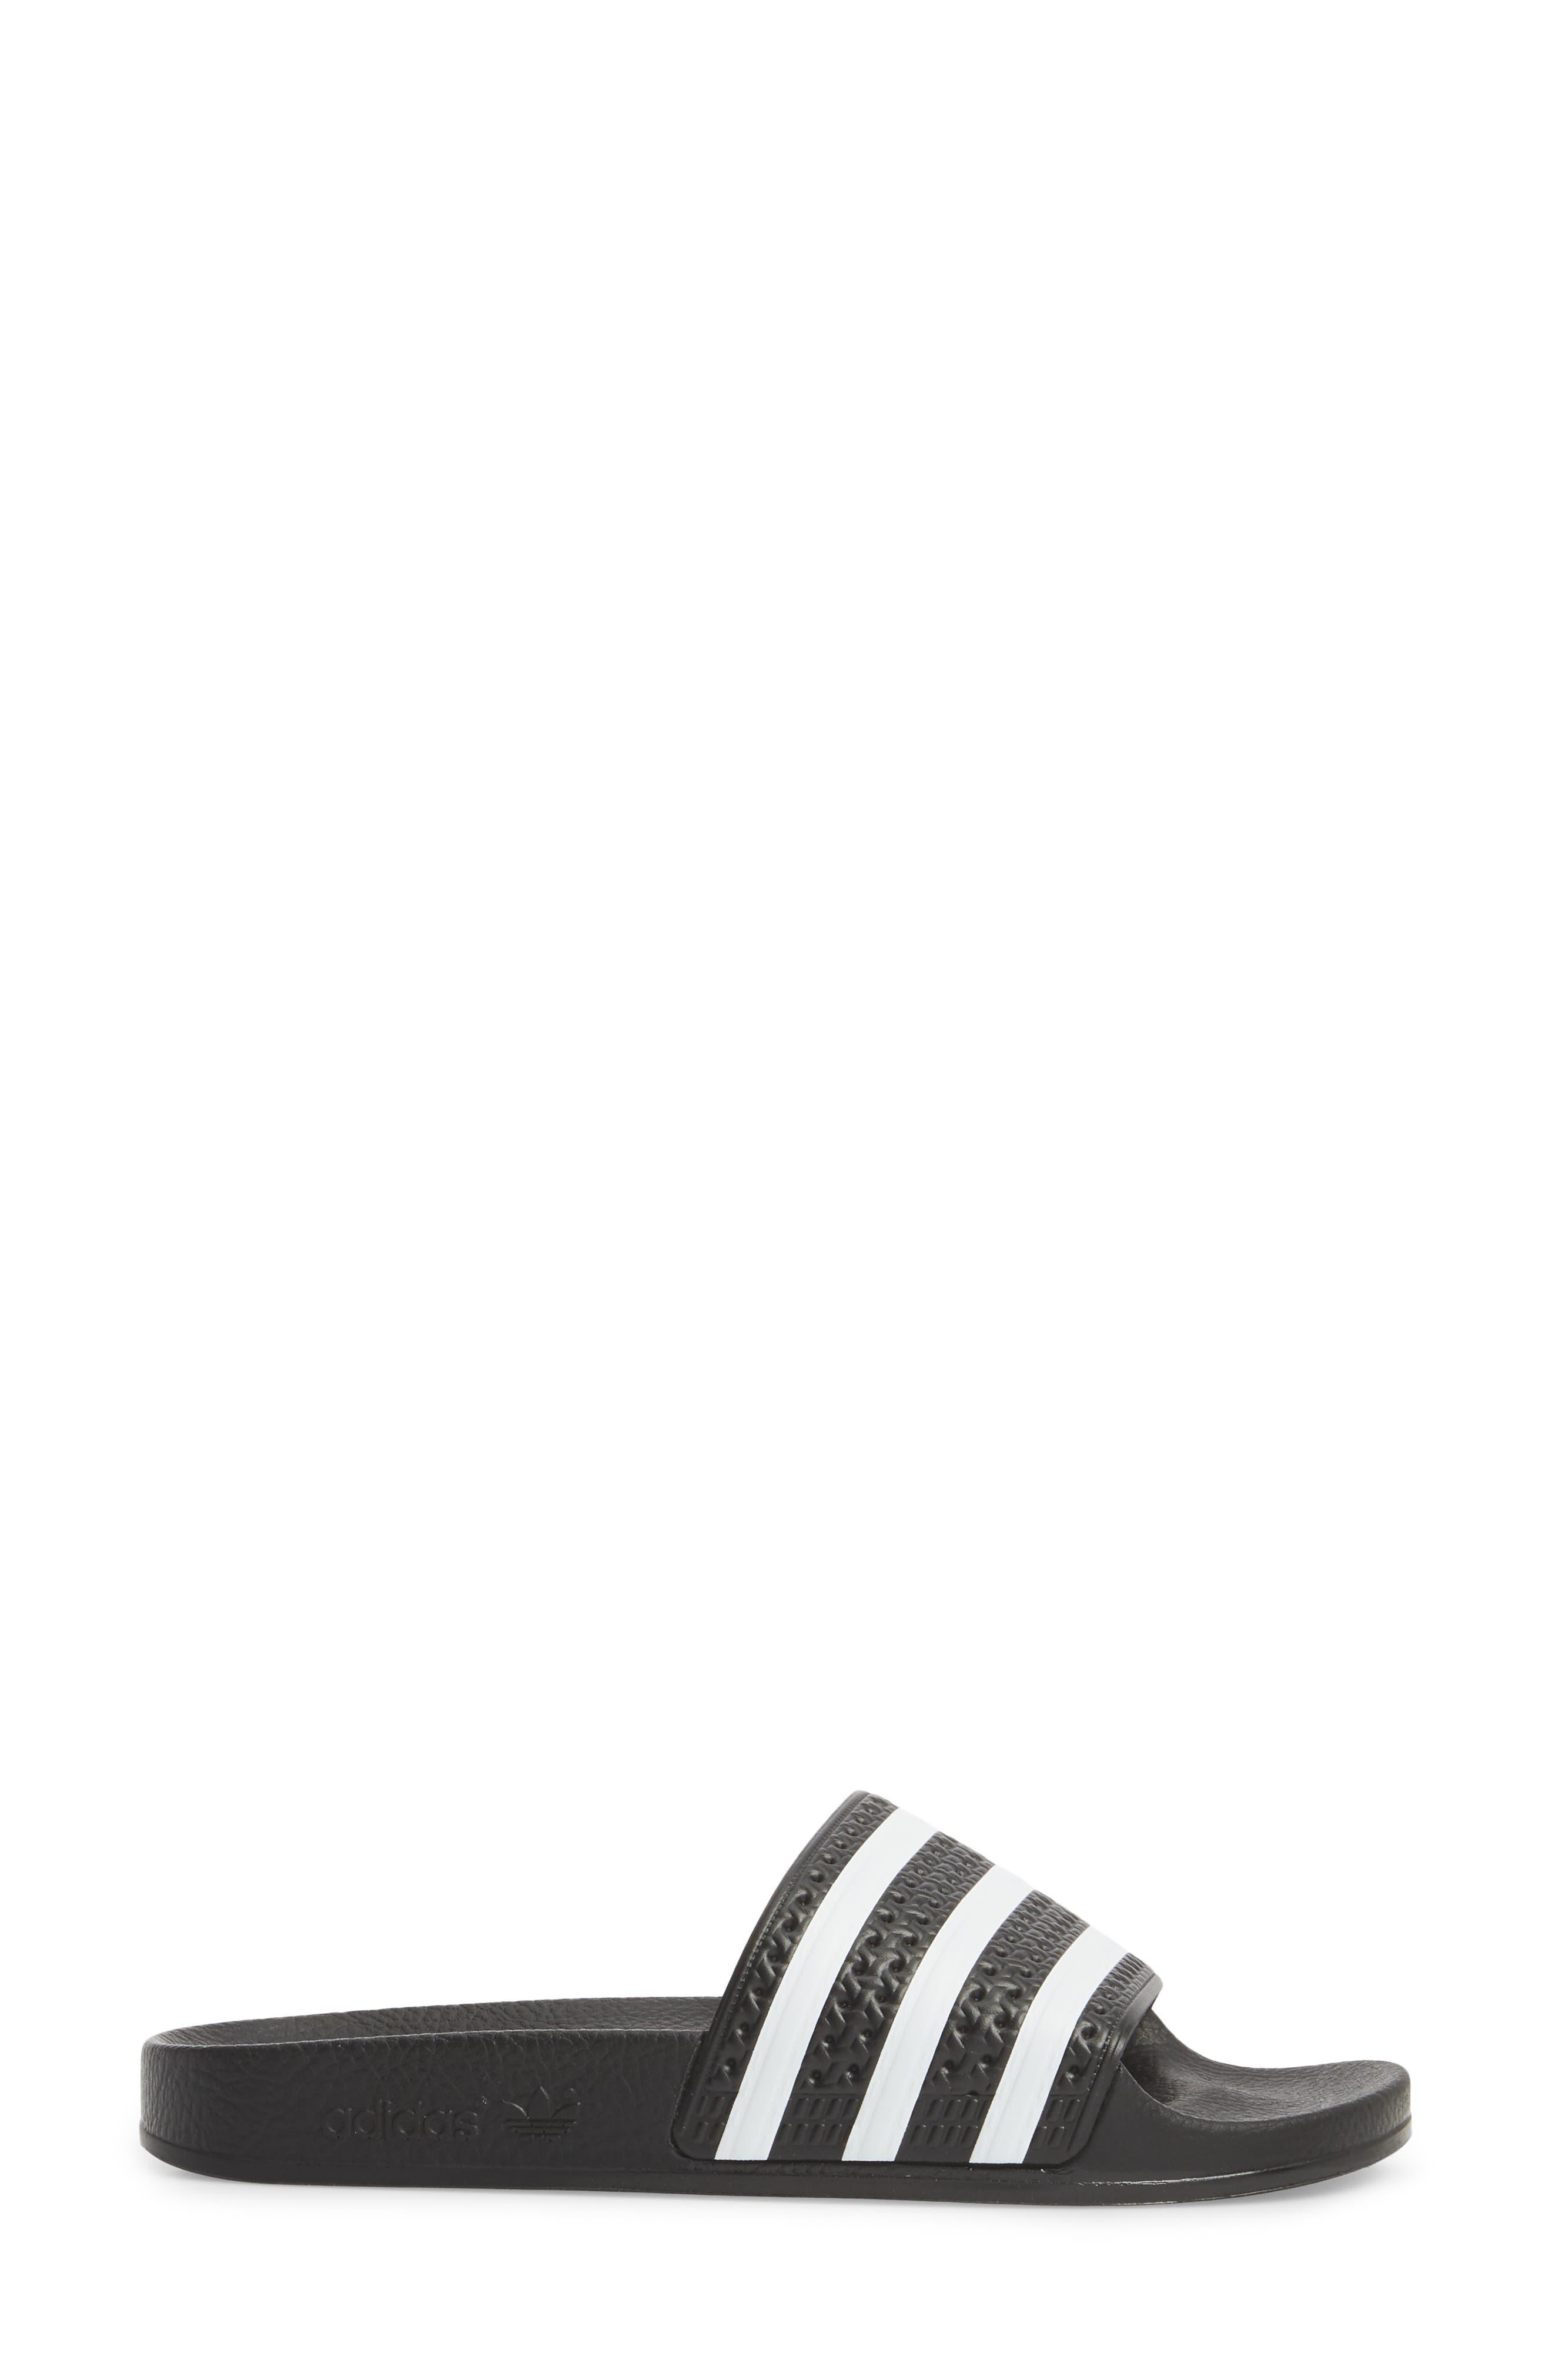 ADIDAS,                             'Adilette' Slide Sandal,                             Alternate thumbnail 3, color,                             CORE BLACK/ WHITE/ CORE BLACK